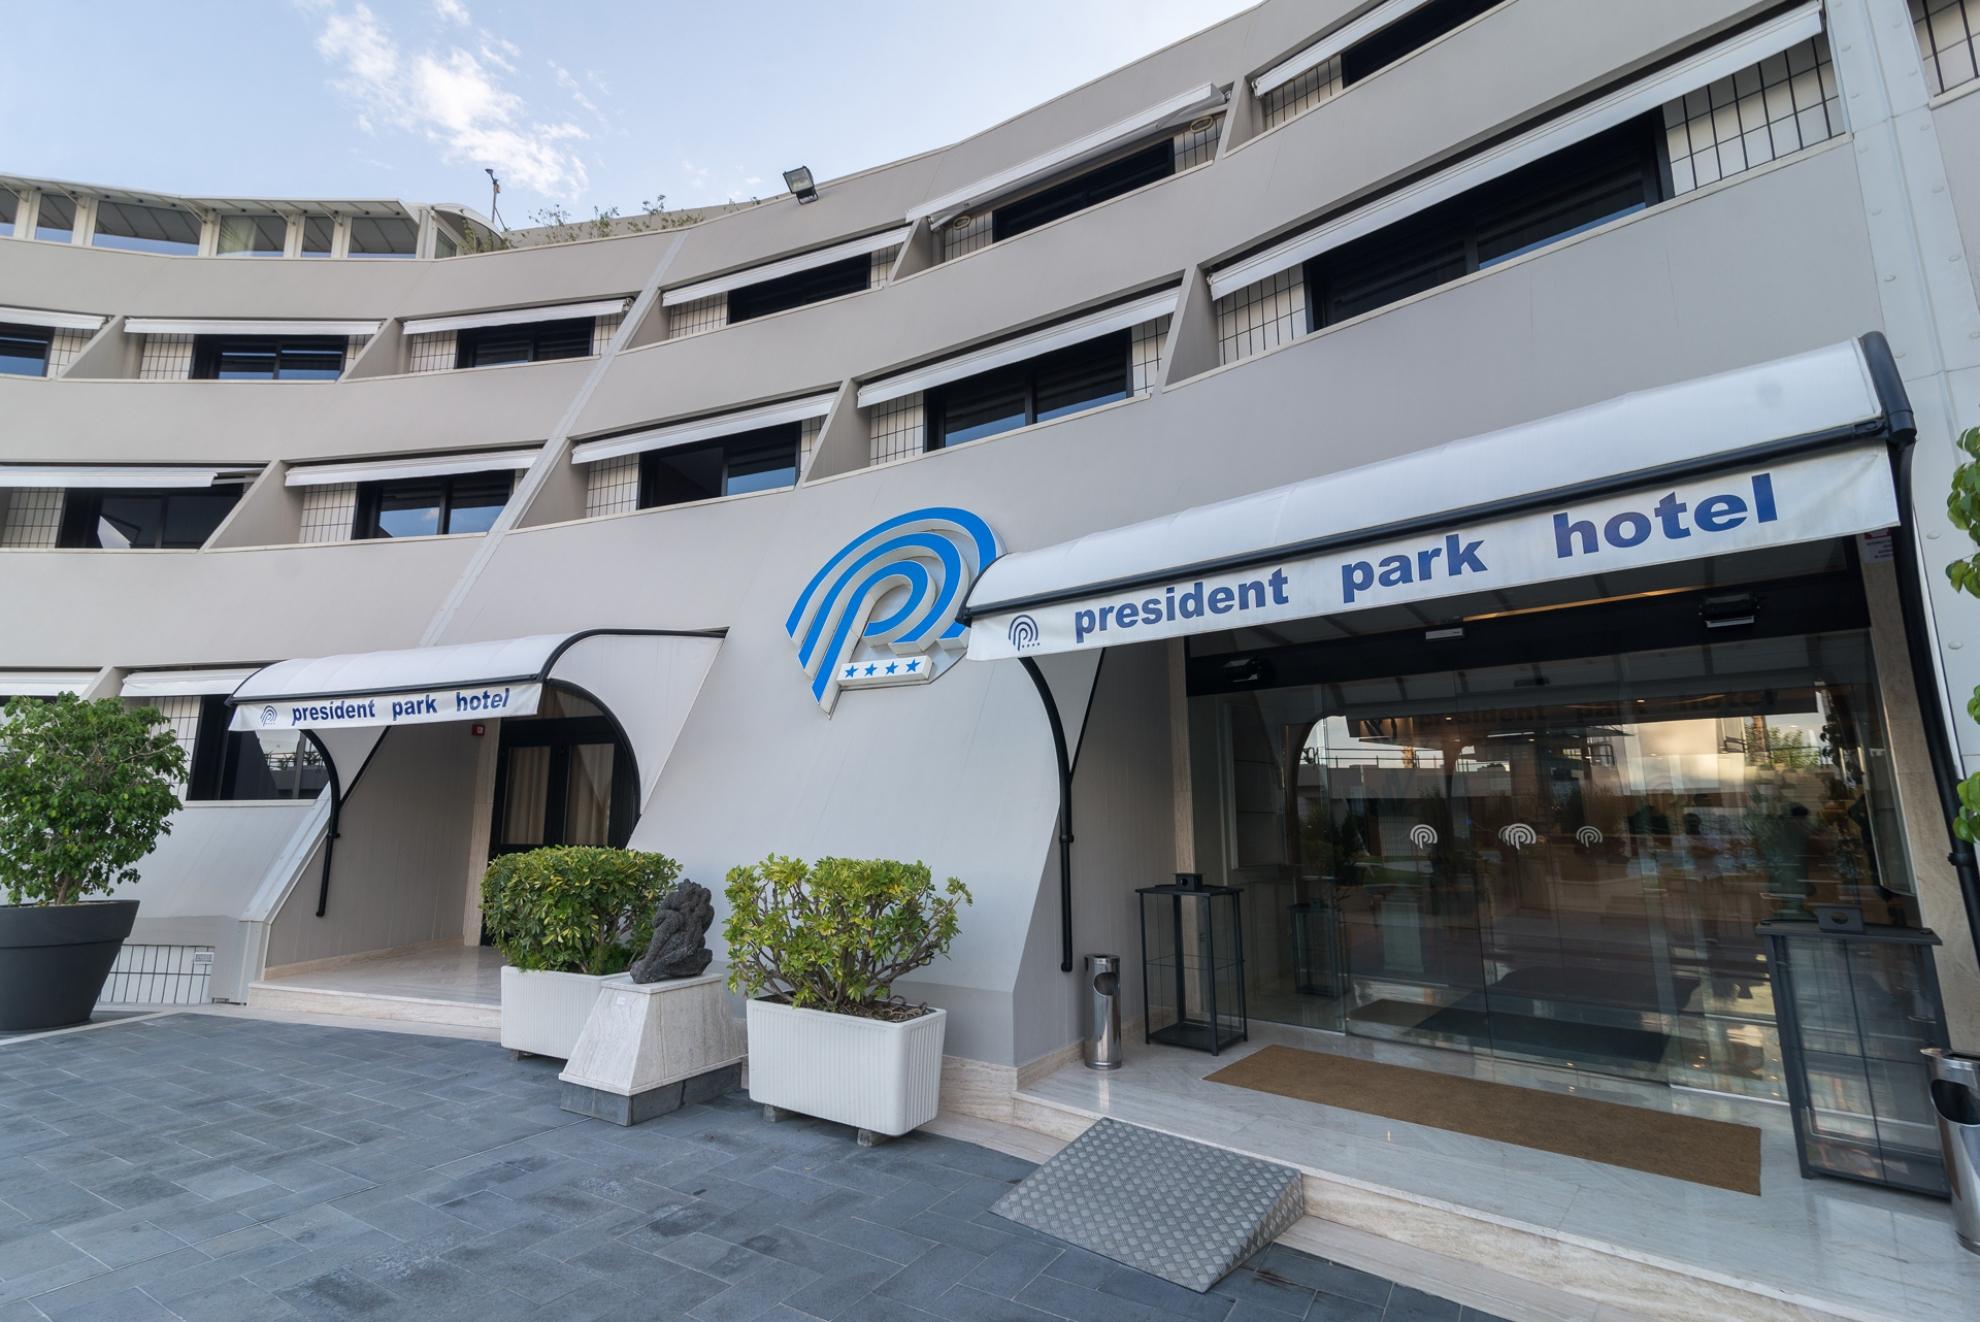 President Park Hotel - Hotel Ristorante, Aci Catena